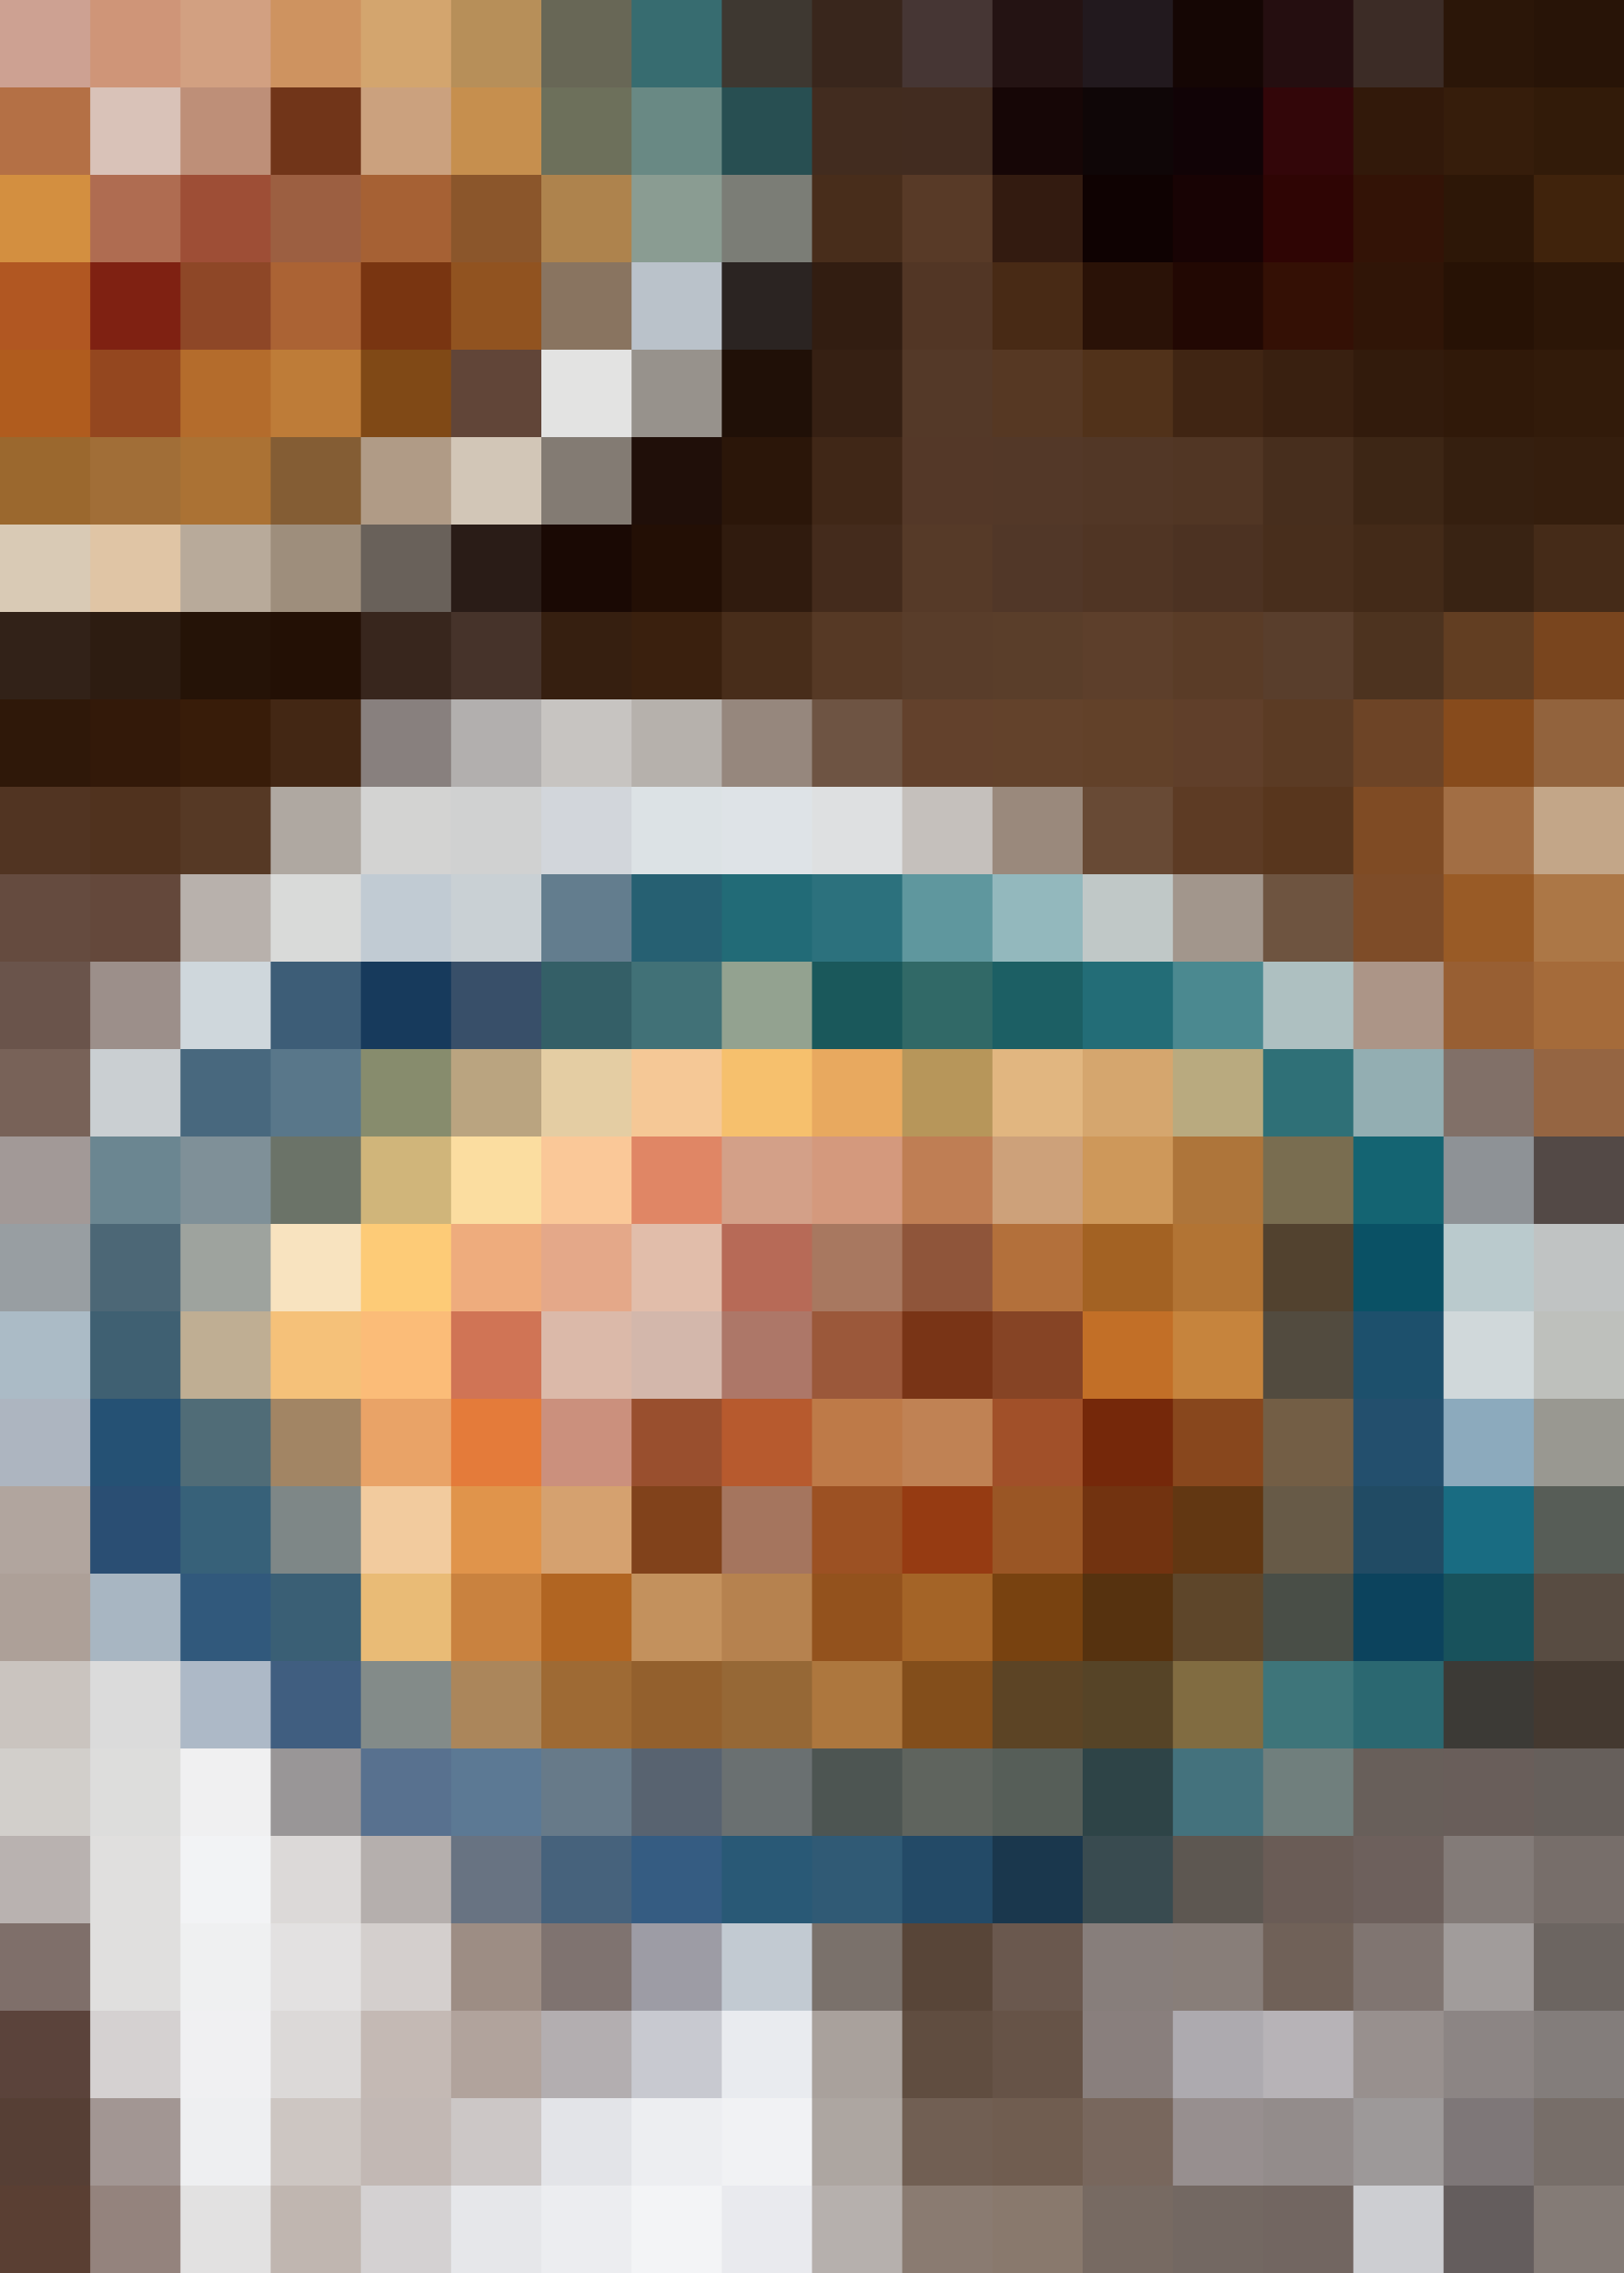 How To Make Marinara Pasta Sauce: gallery image 10